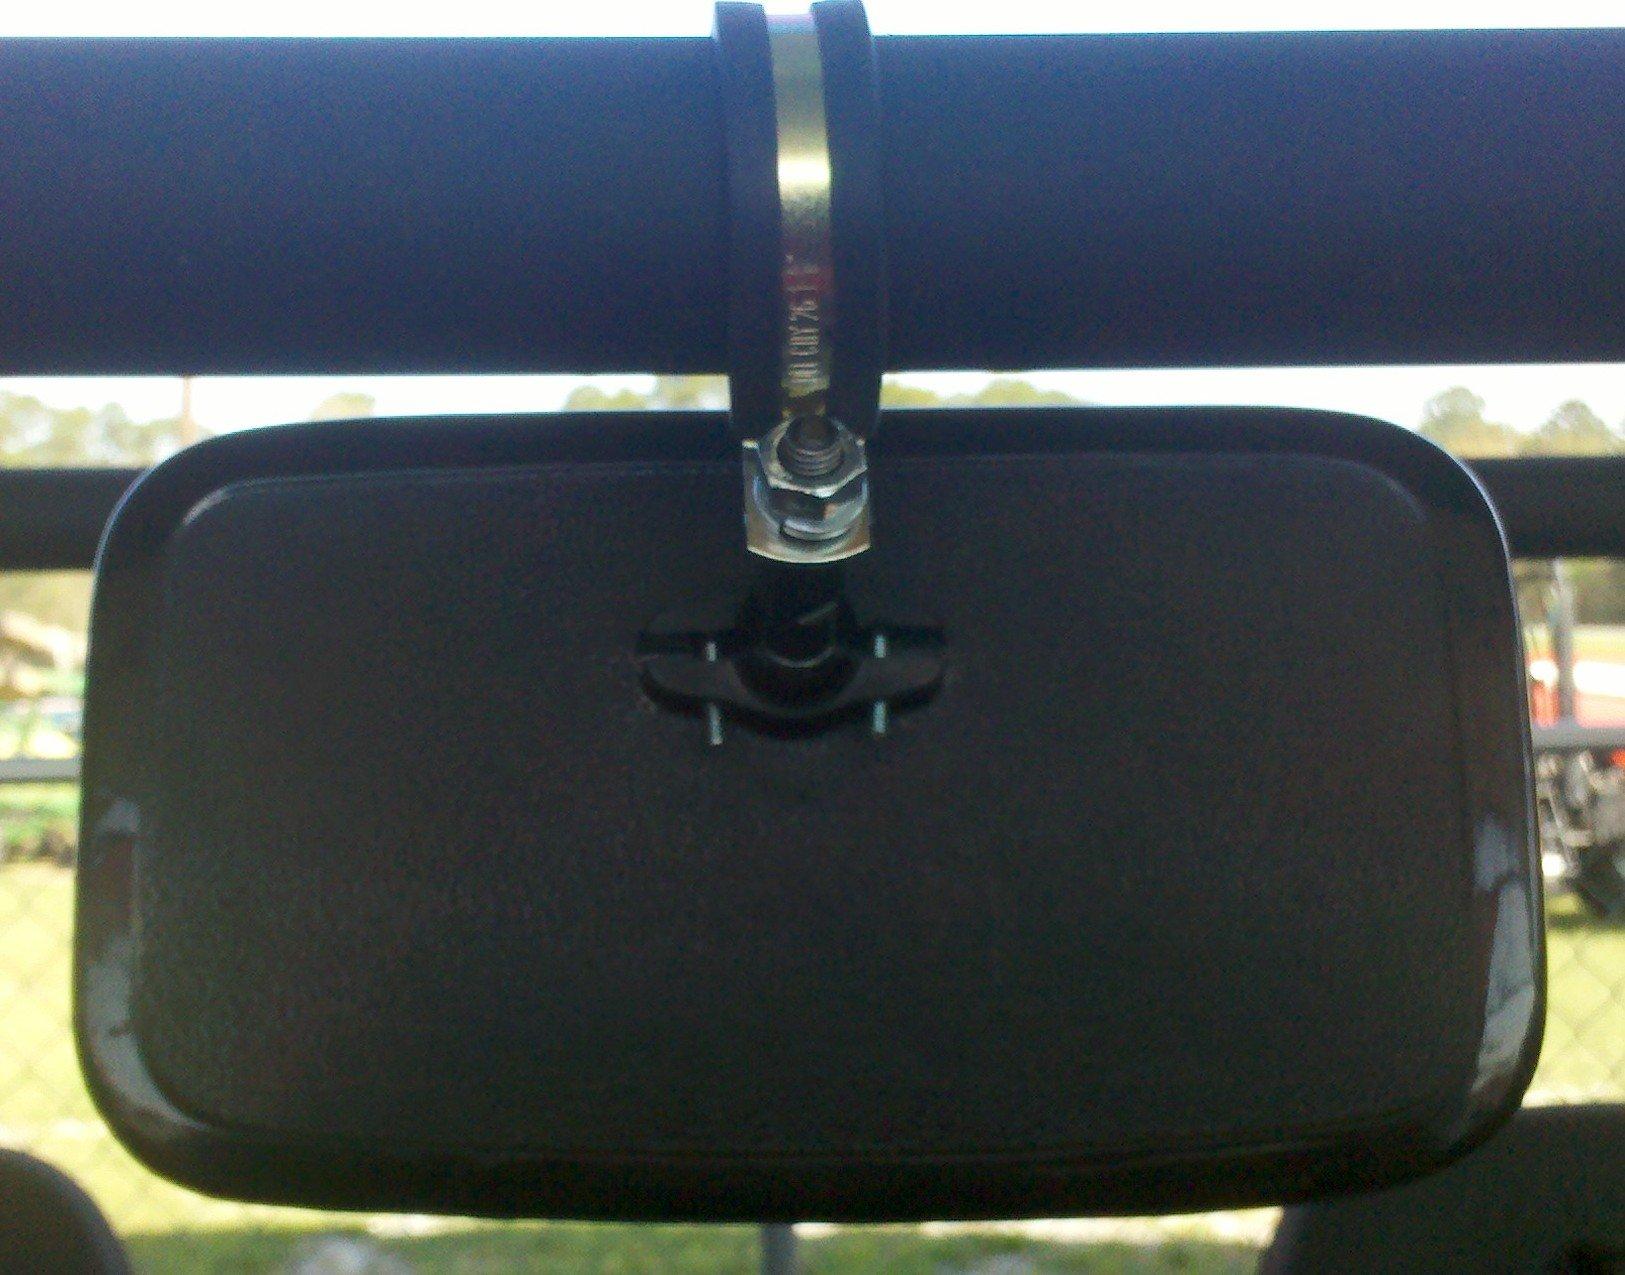 Kubota Tractor Rear View Mirror : Maverick advantage rear view mirror fits kubota rvt